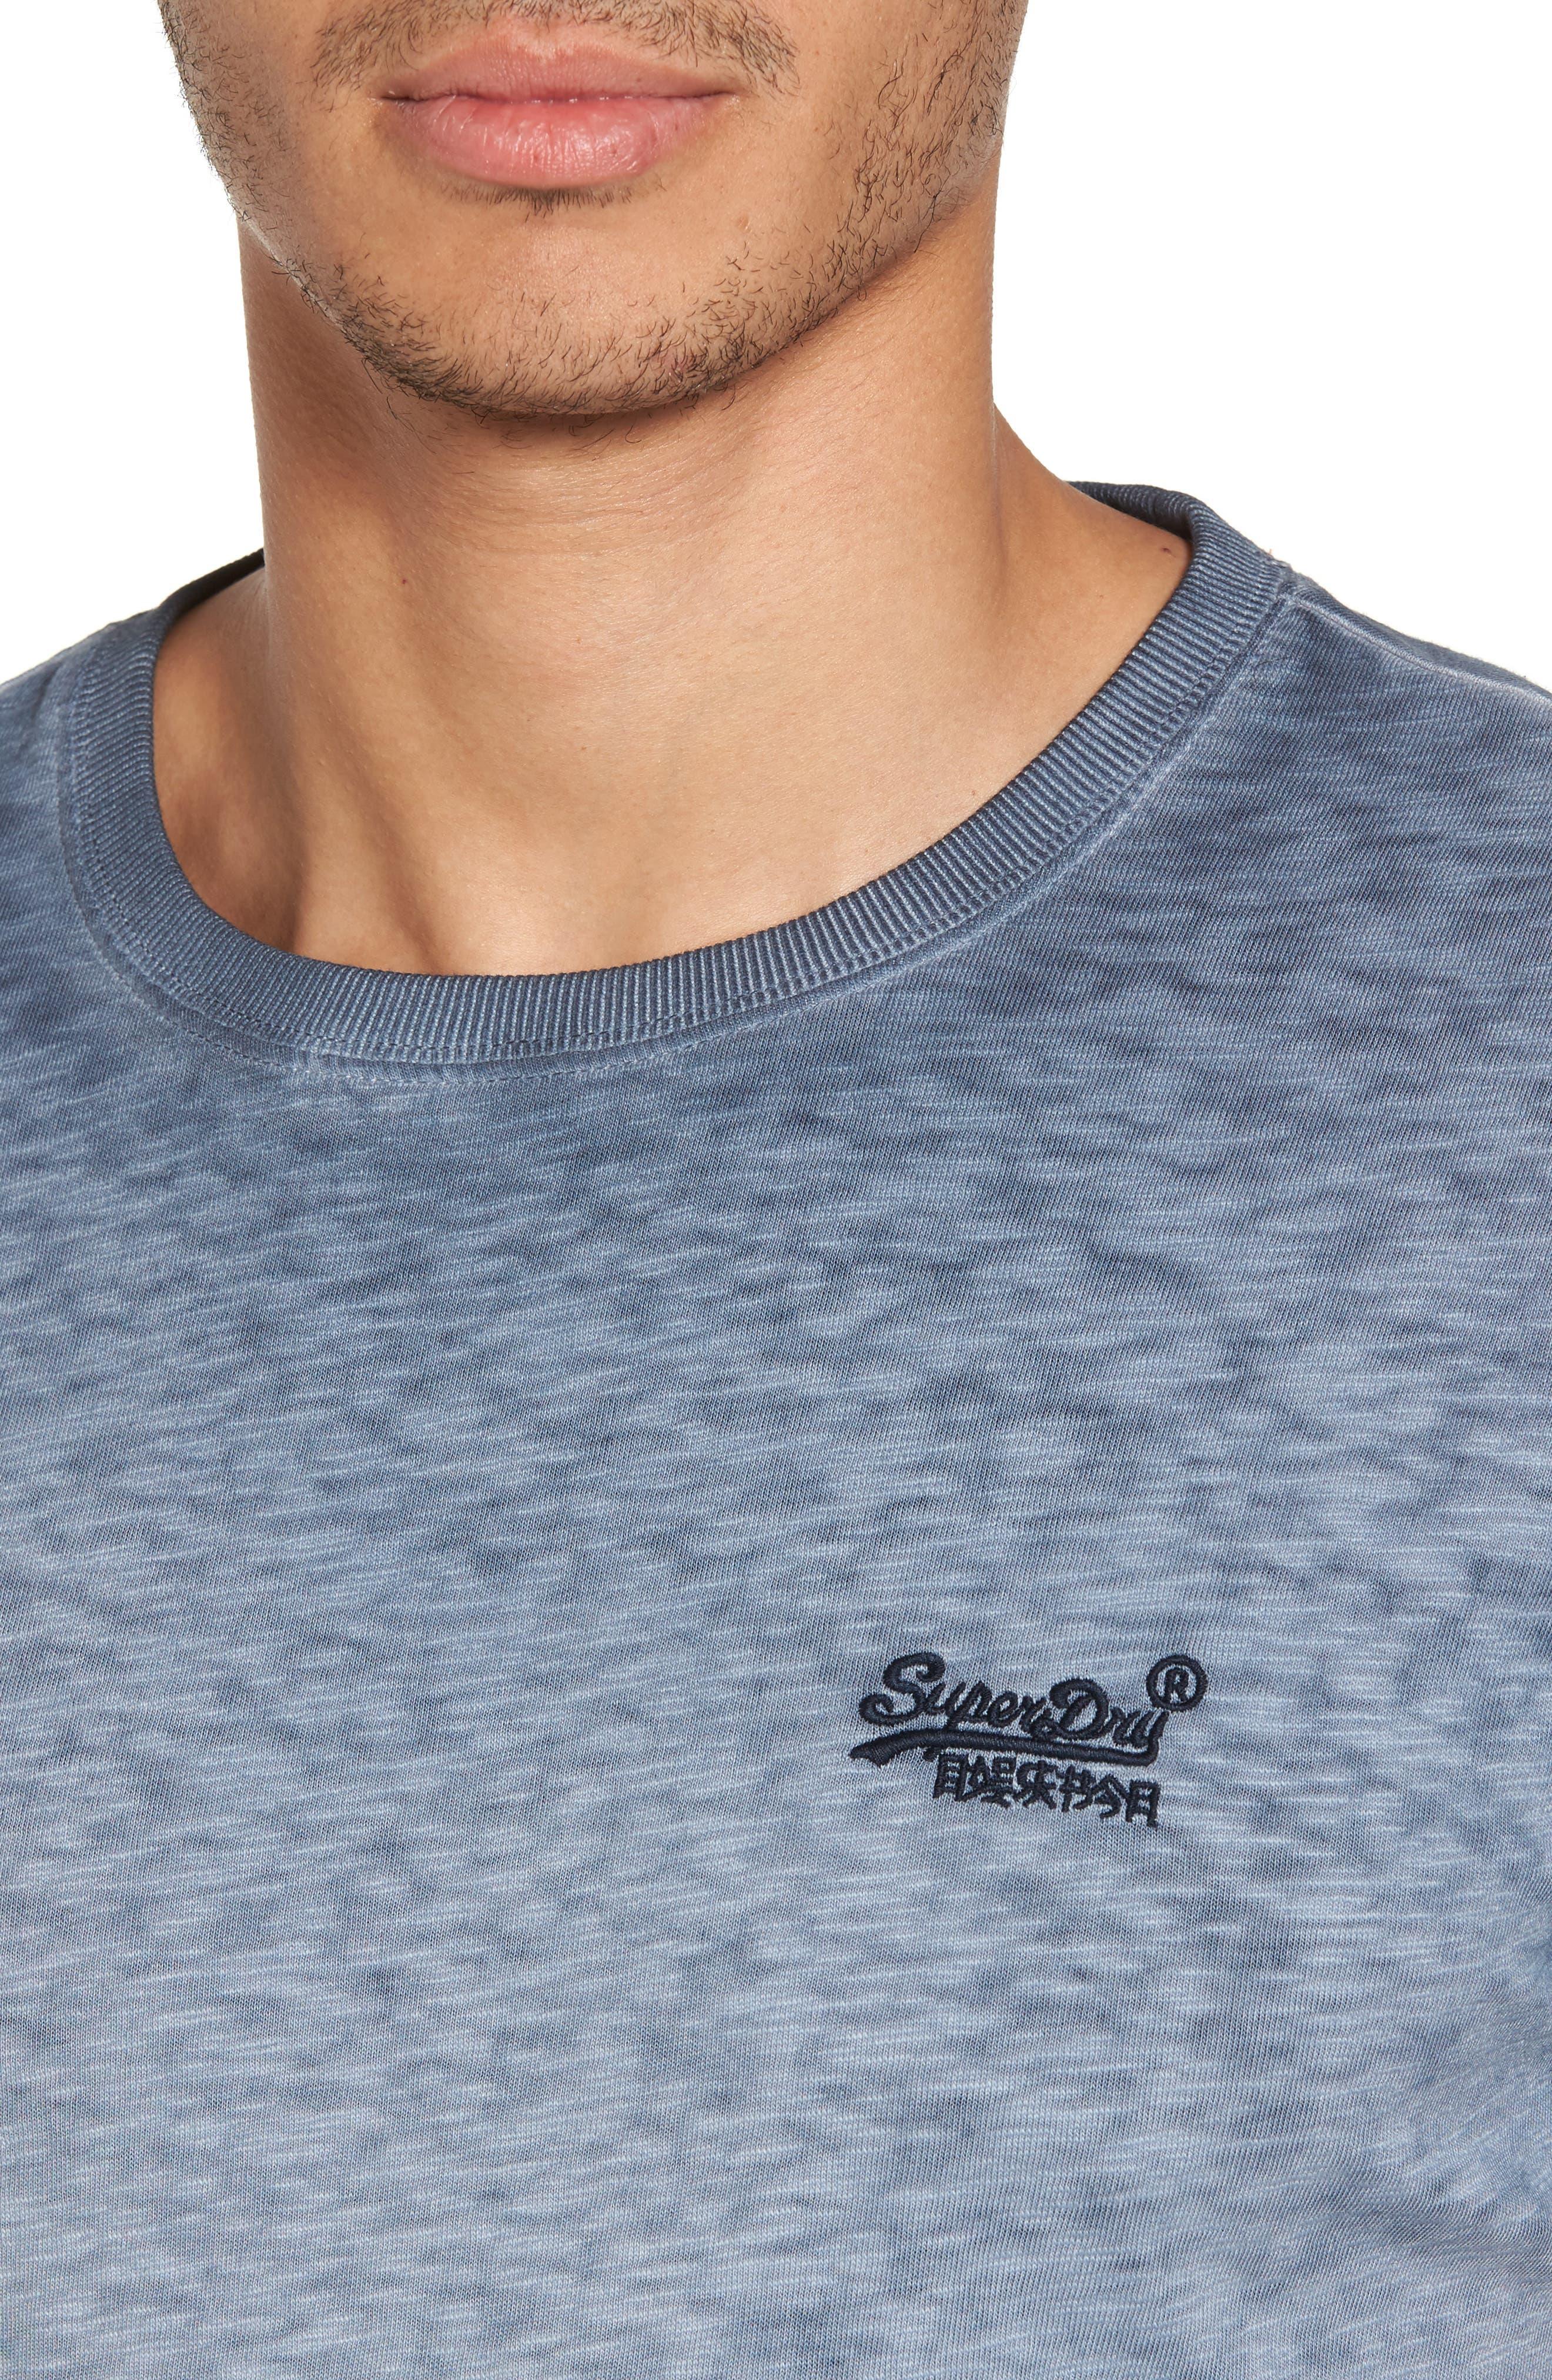 Orange Label Low Roller T-Shirt,                             Alternate thumbnail 17, color,